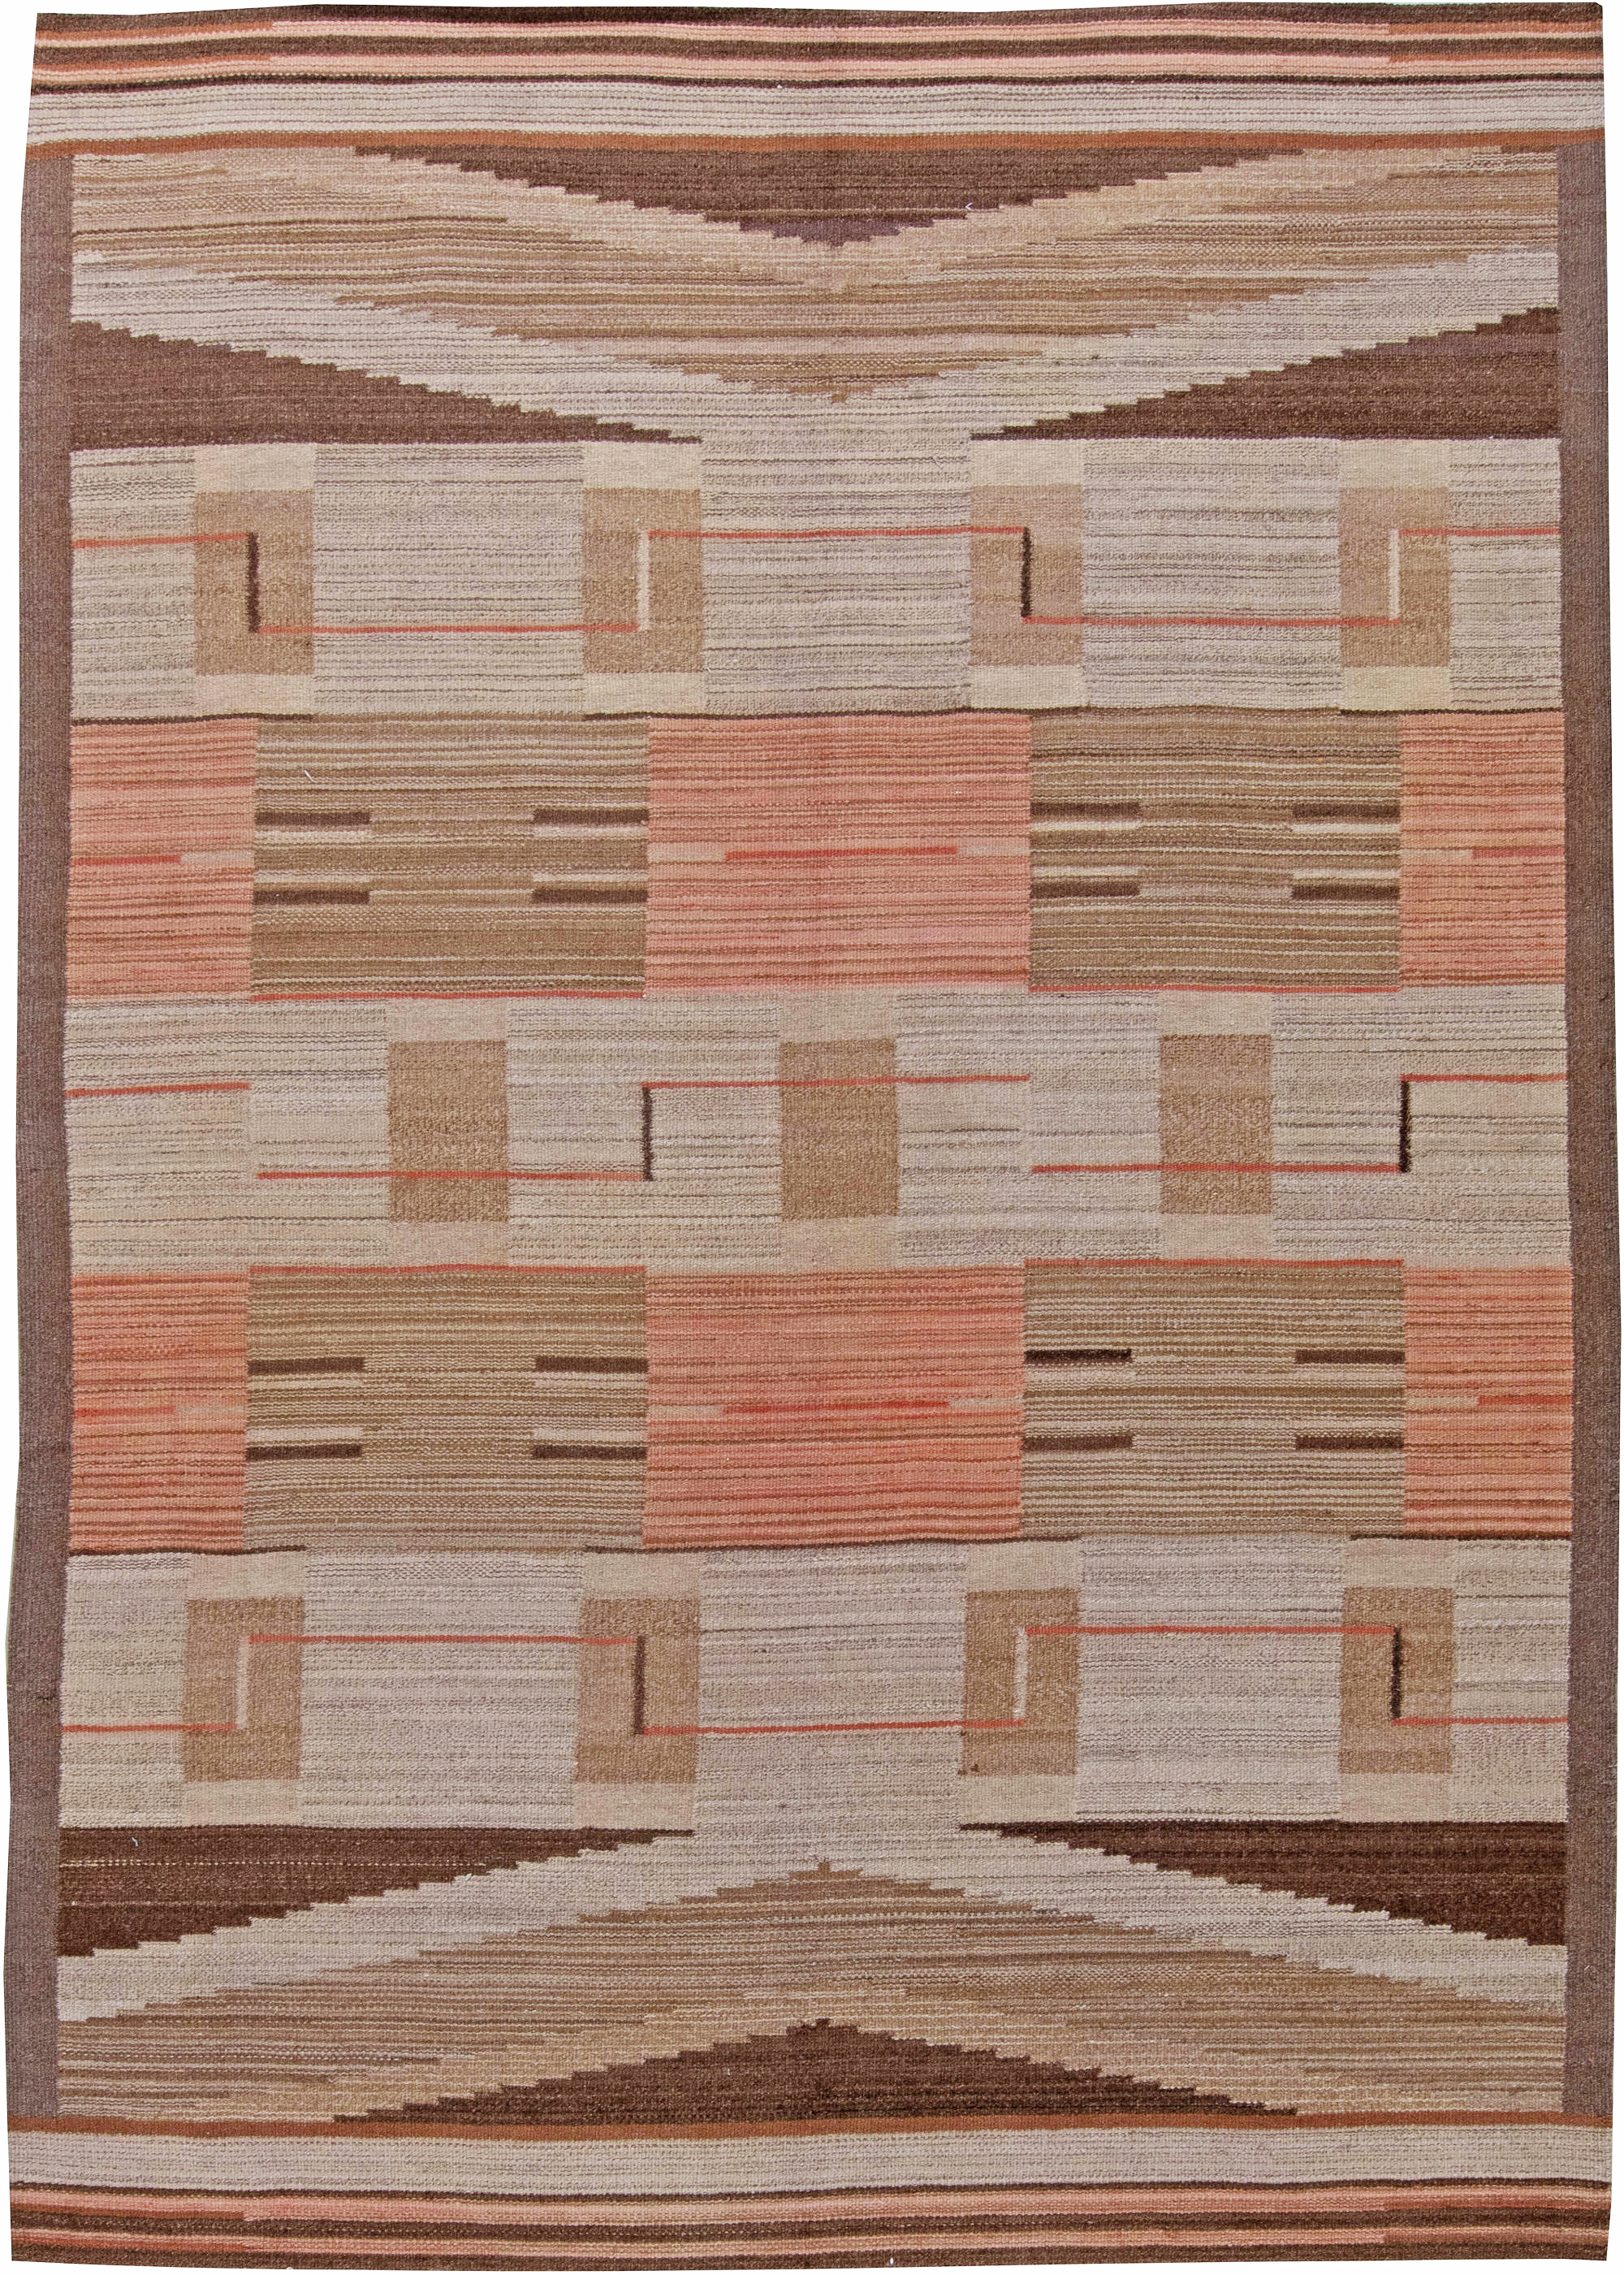 Vintage Swedish Flat Weave Rug Bb6254 By Doris Leslie Blau